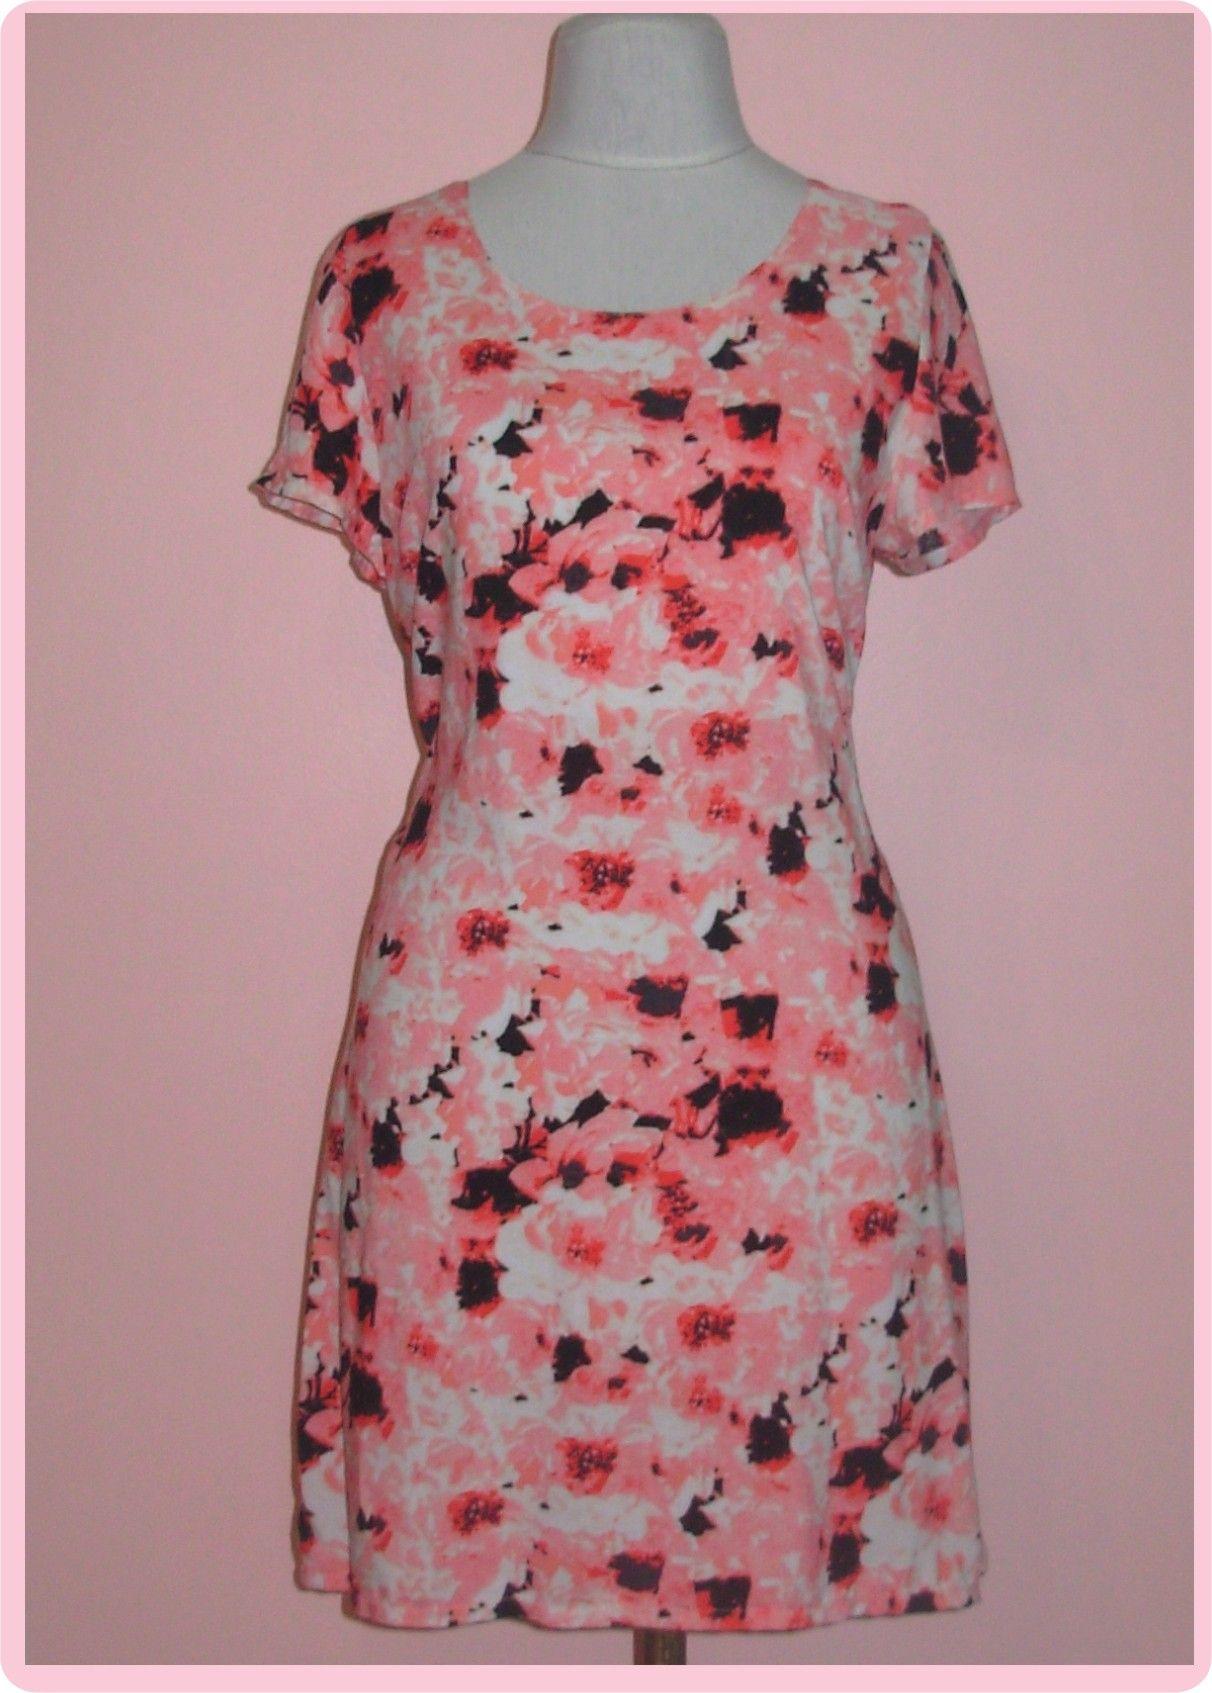 Vestido de fibrana entallado !!! | Vestidos Maura <3 | Pinterest ...